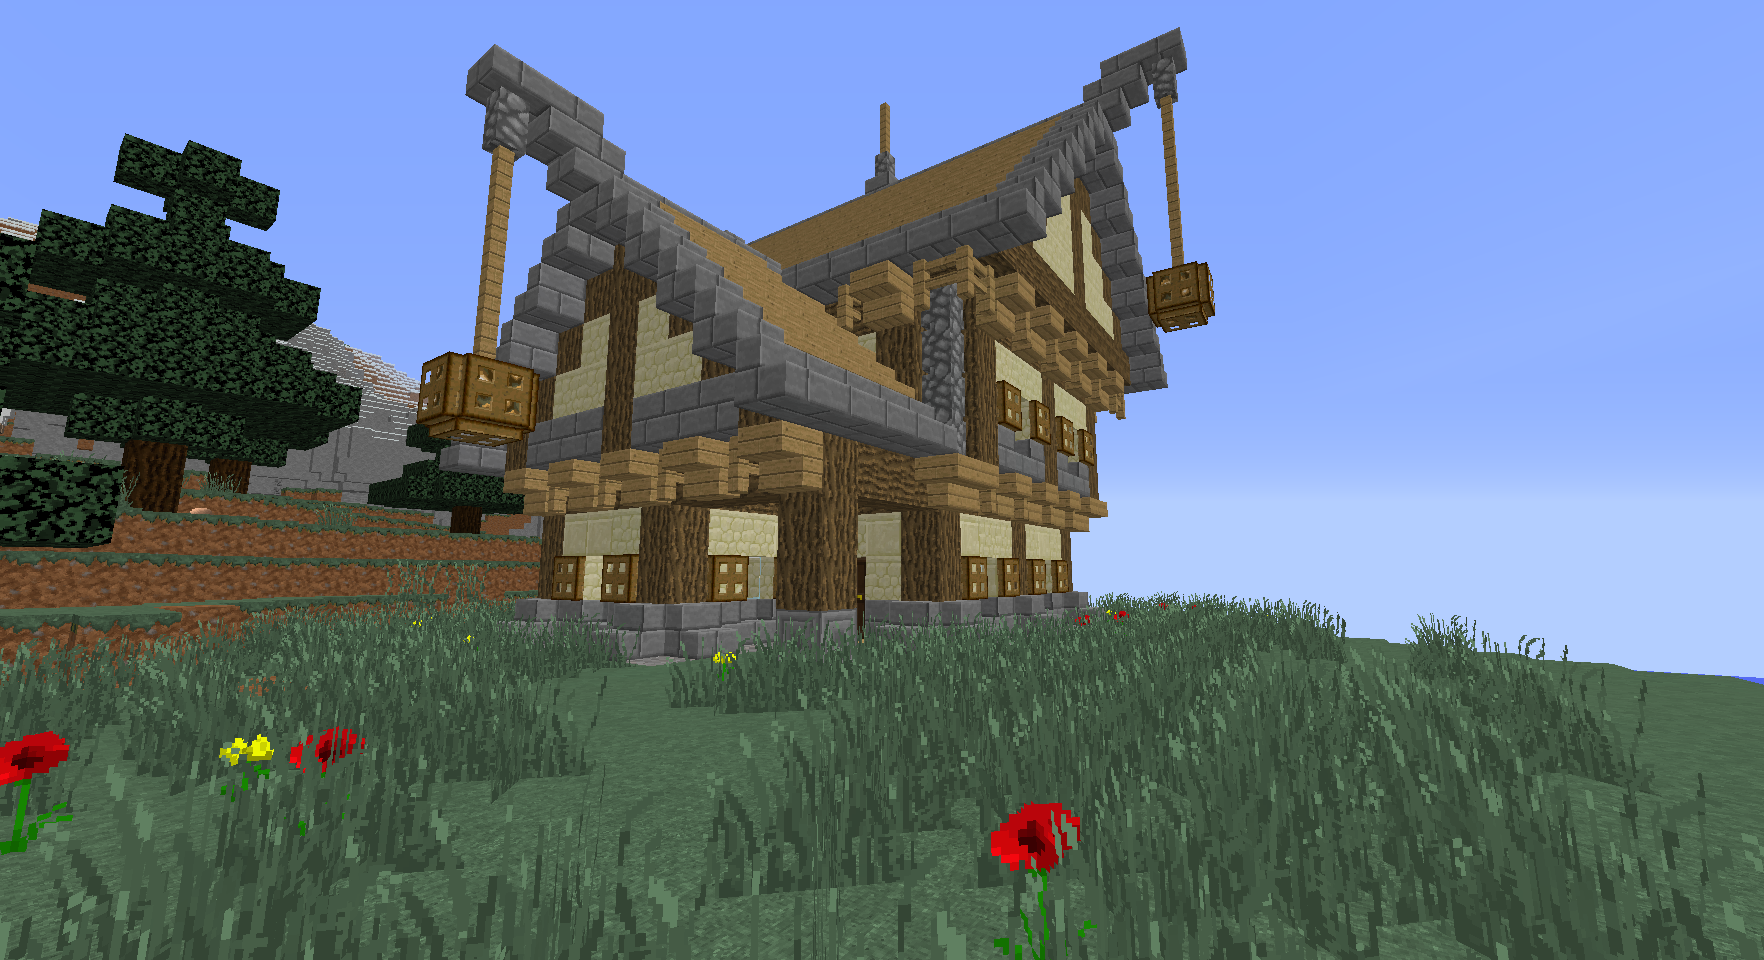 Minecraft Maison Medieval Big Medieval House Pour Minecraft